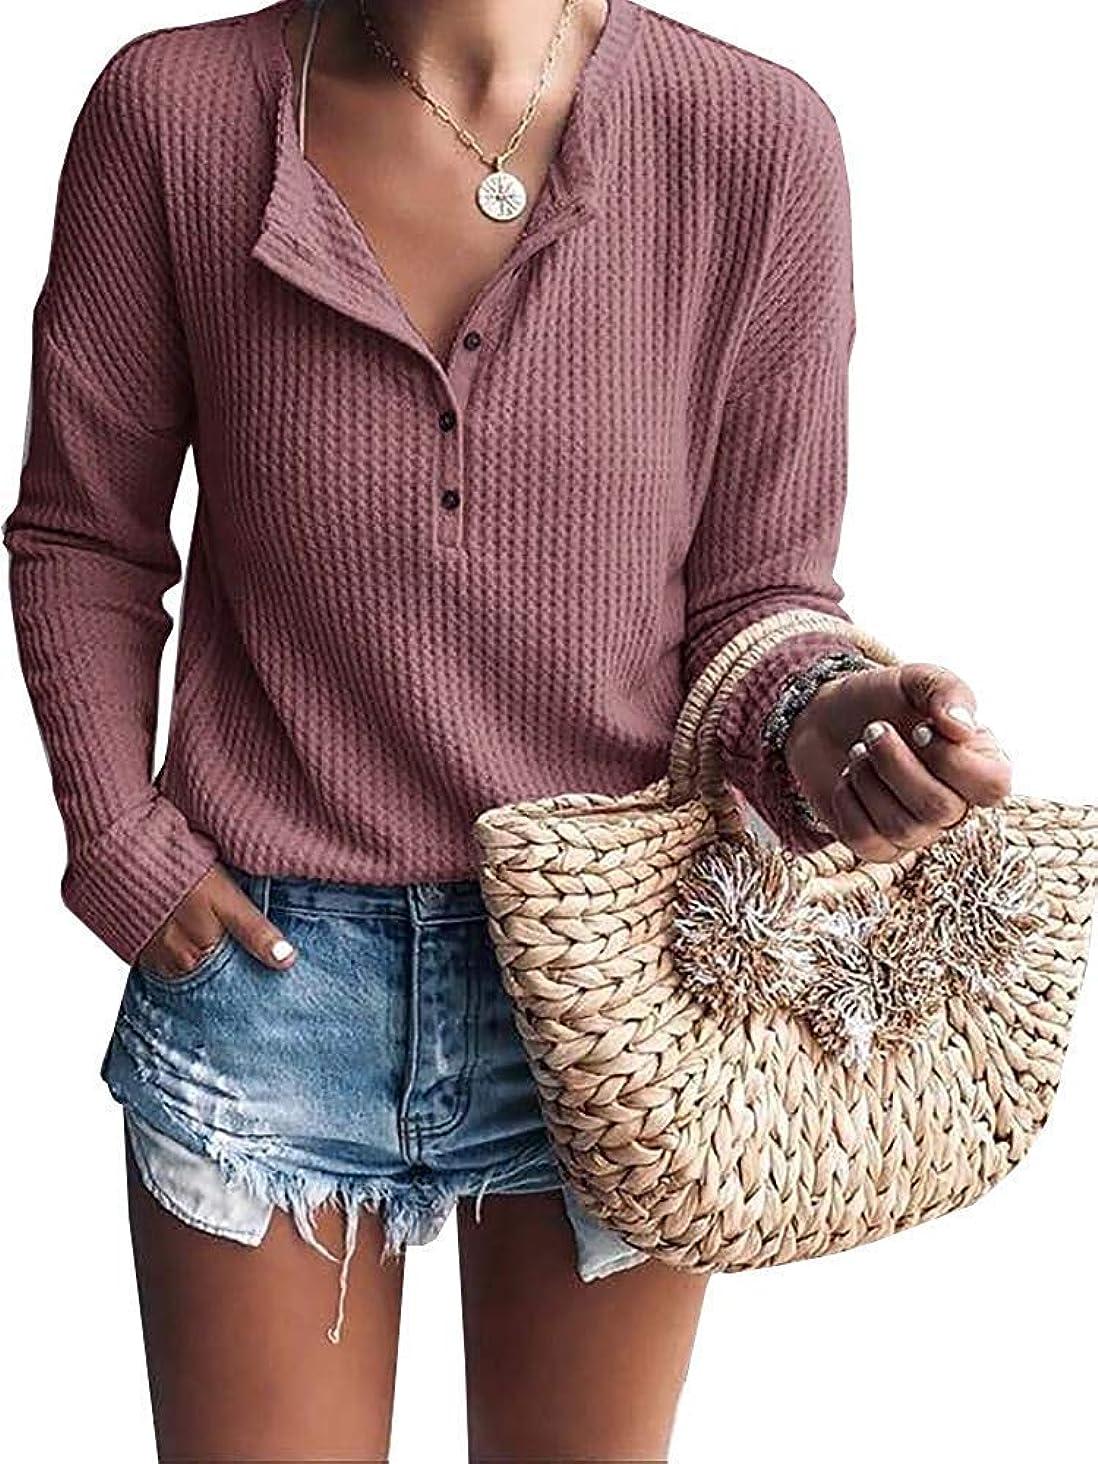 Mafulus Womens Waffle Knit Tunic Tops Loose Long Sleeve Button Up V Neck Henley Shirts